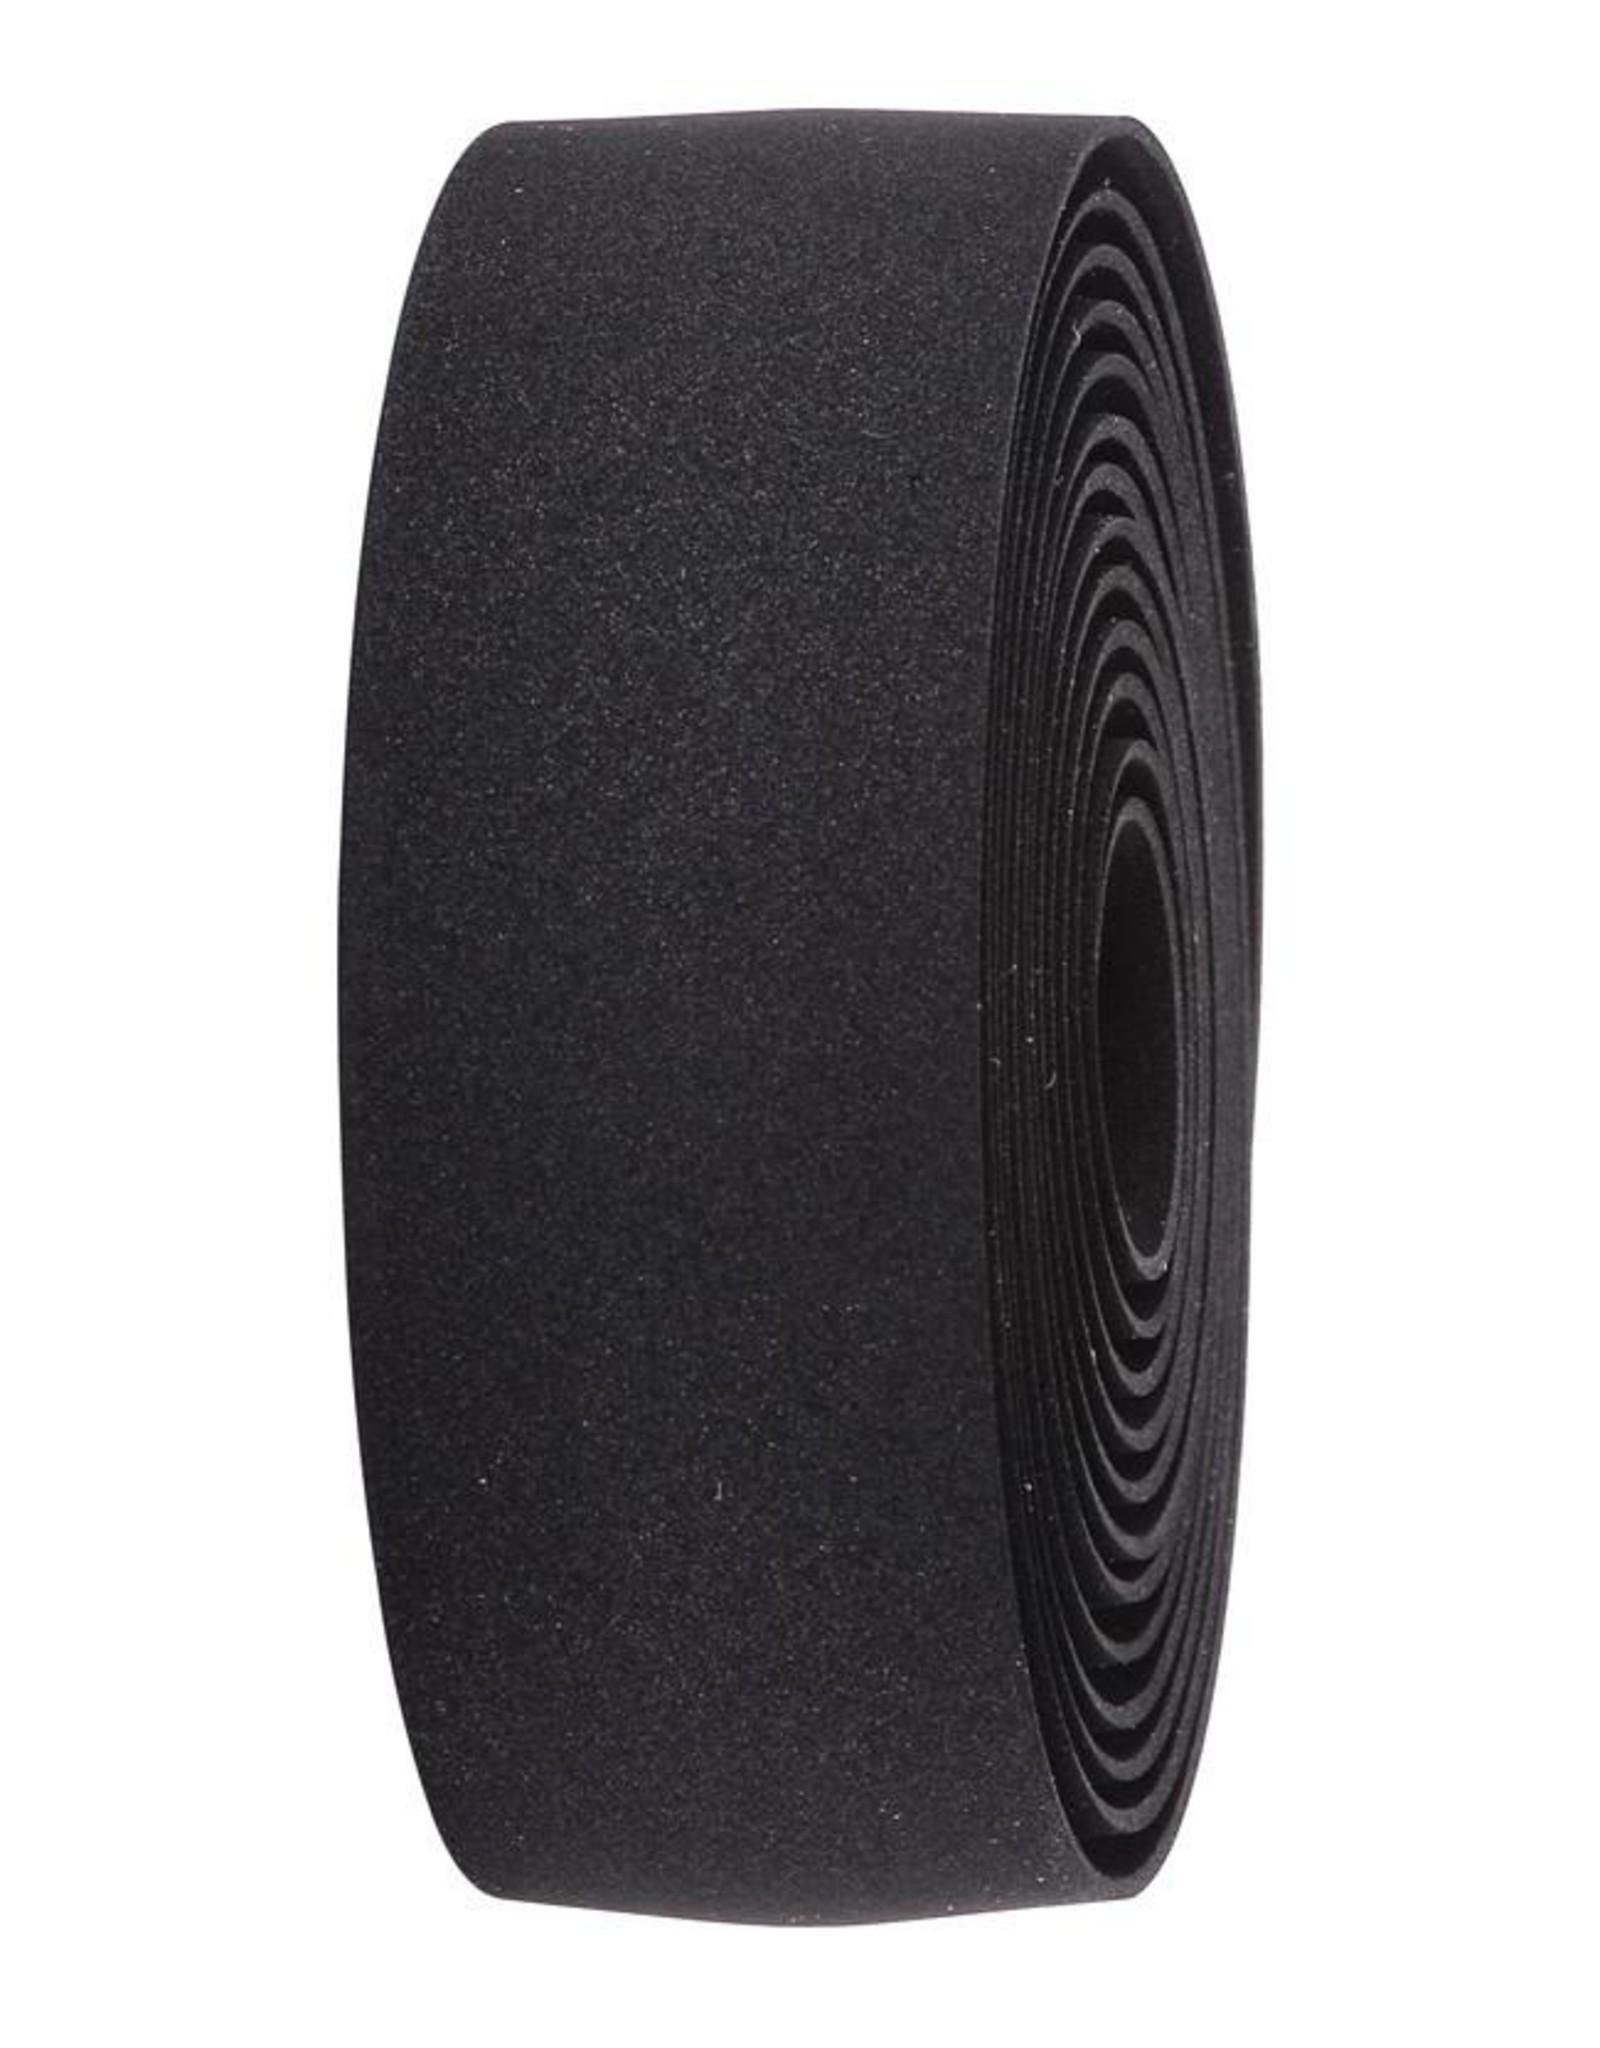 BBB CRD-BHT-01 - RaceRibbon Bar Tape (Black)